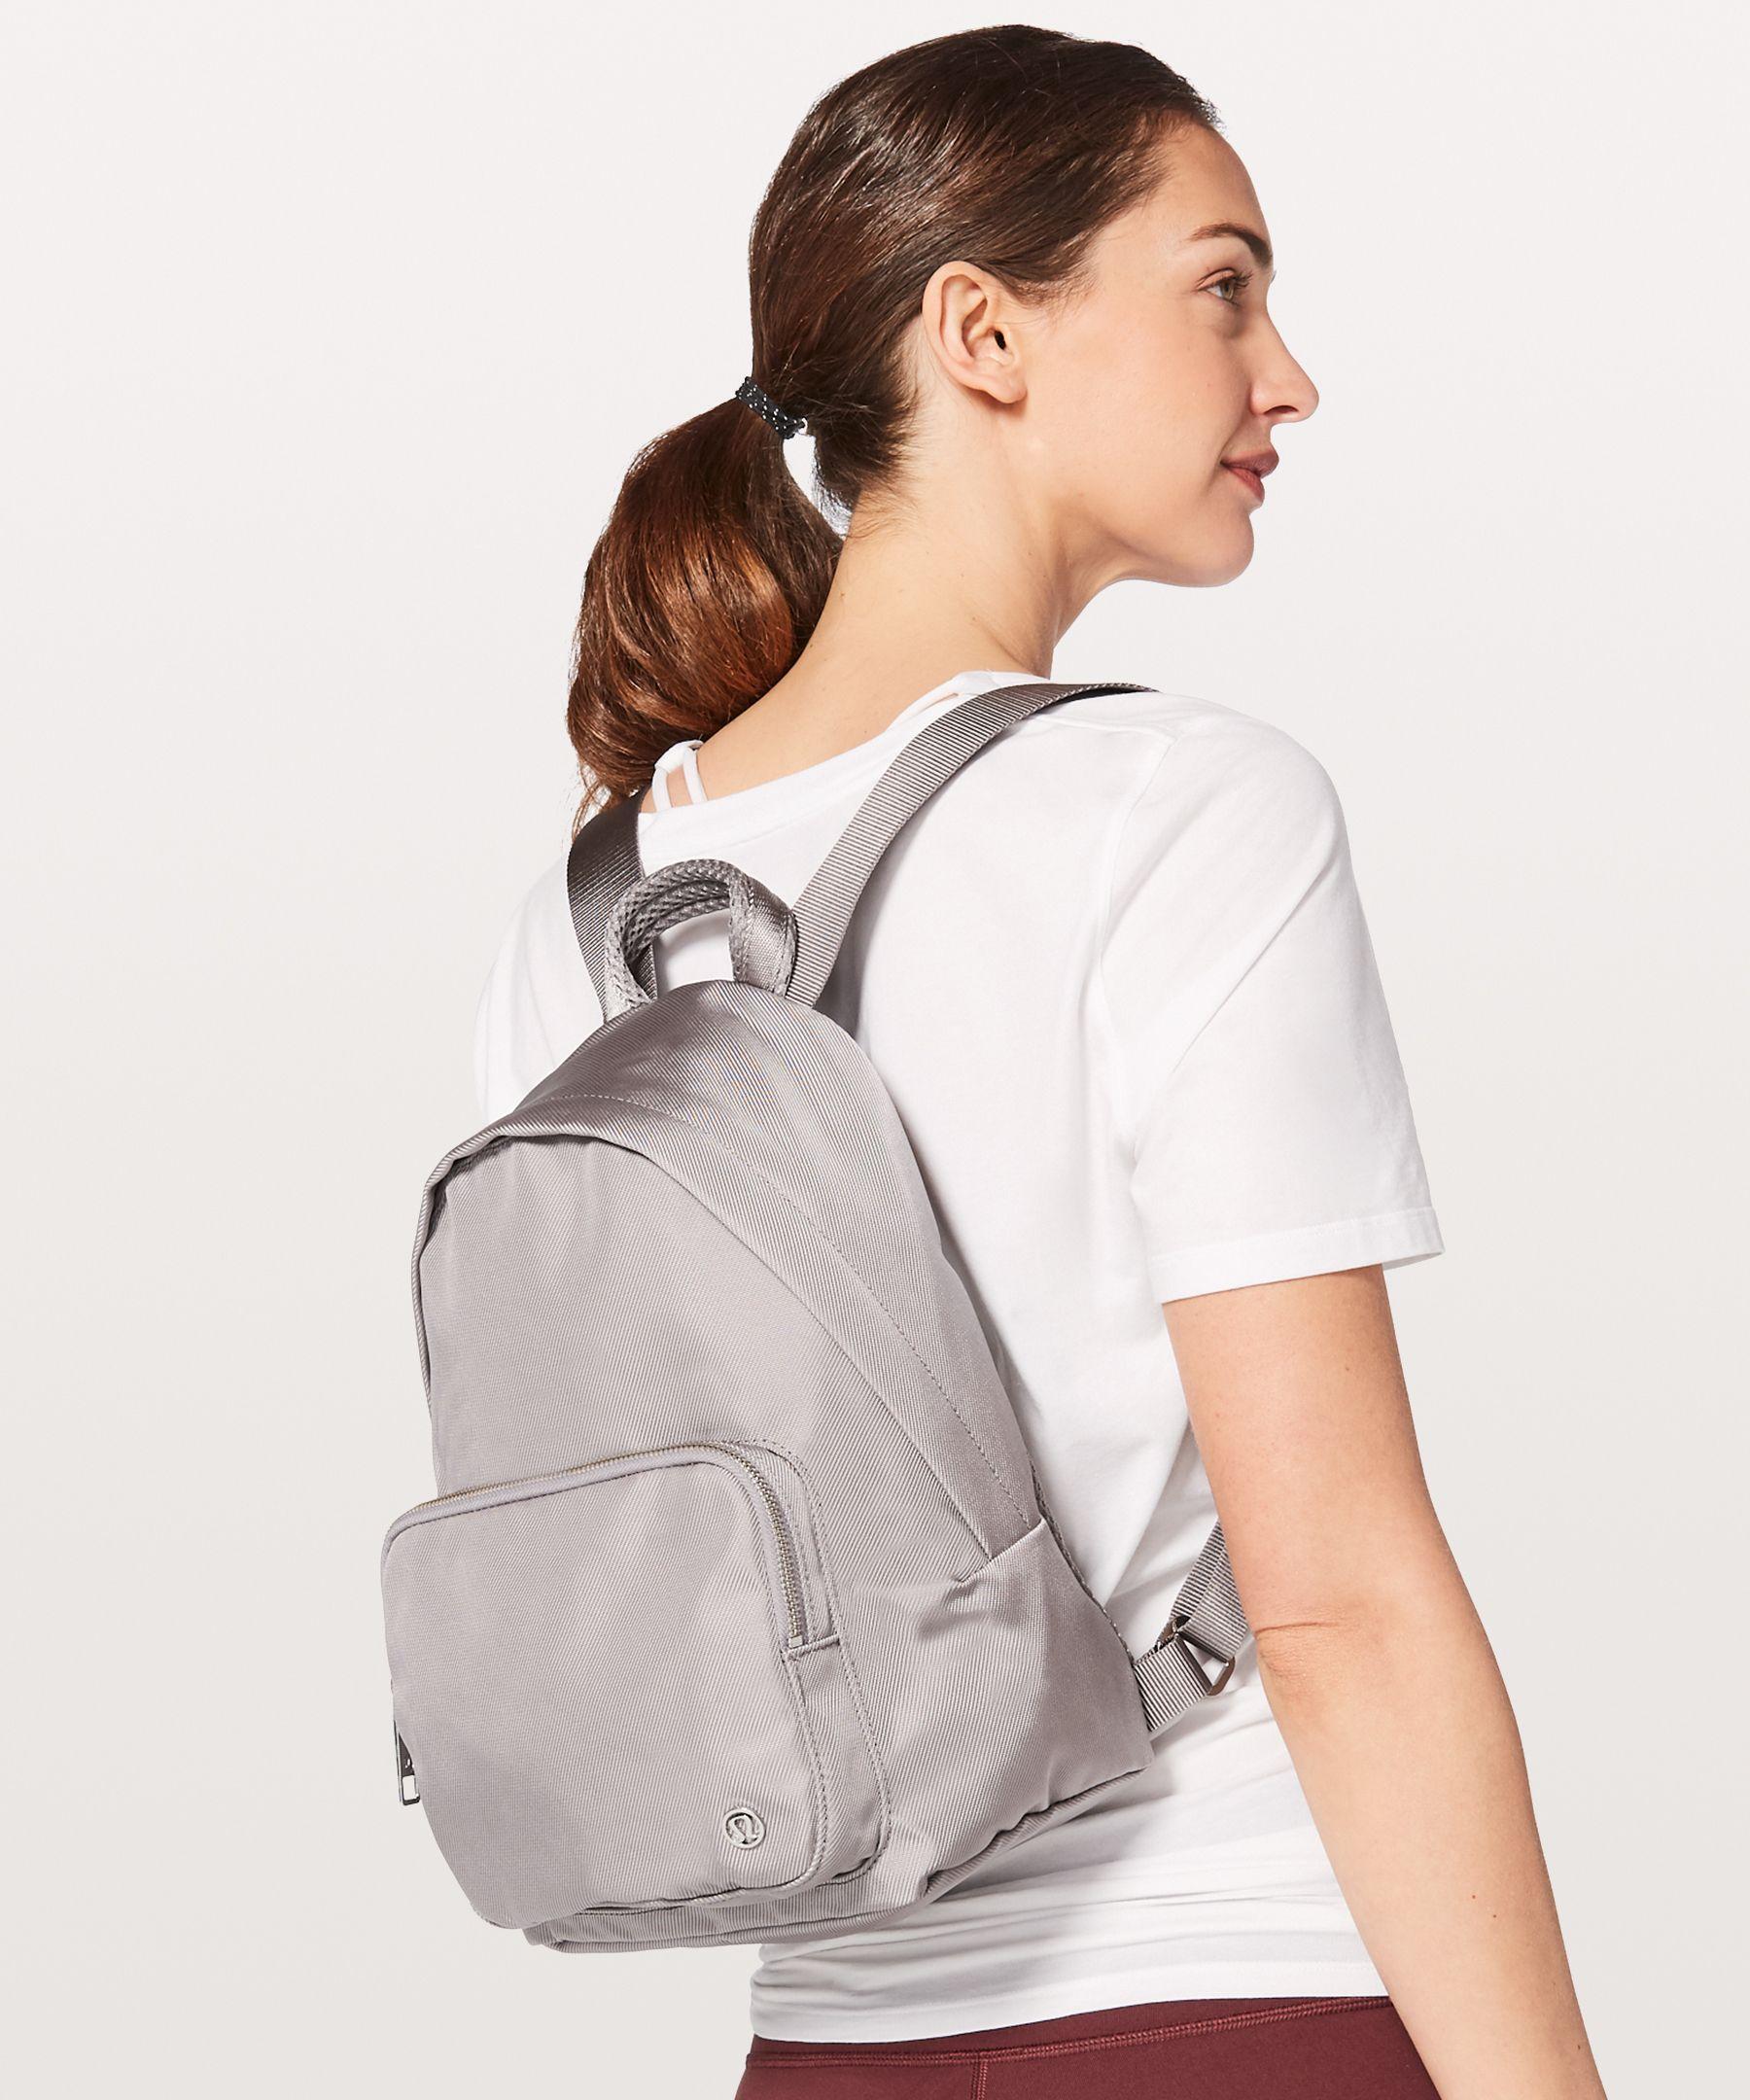 Everywhere Backpack Mini 5 L New by Lululemon